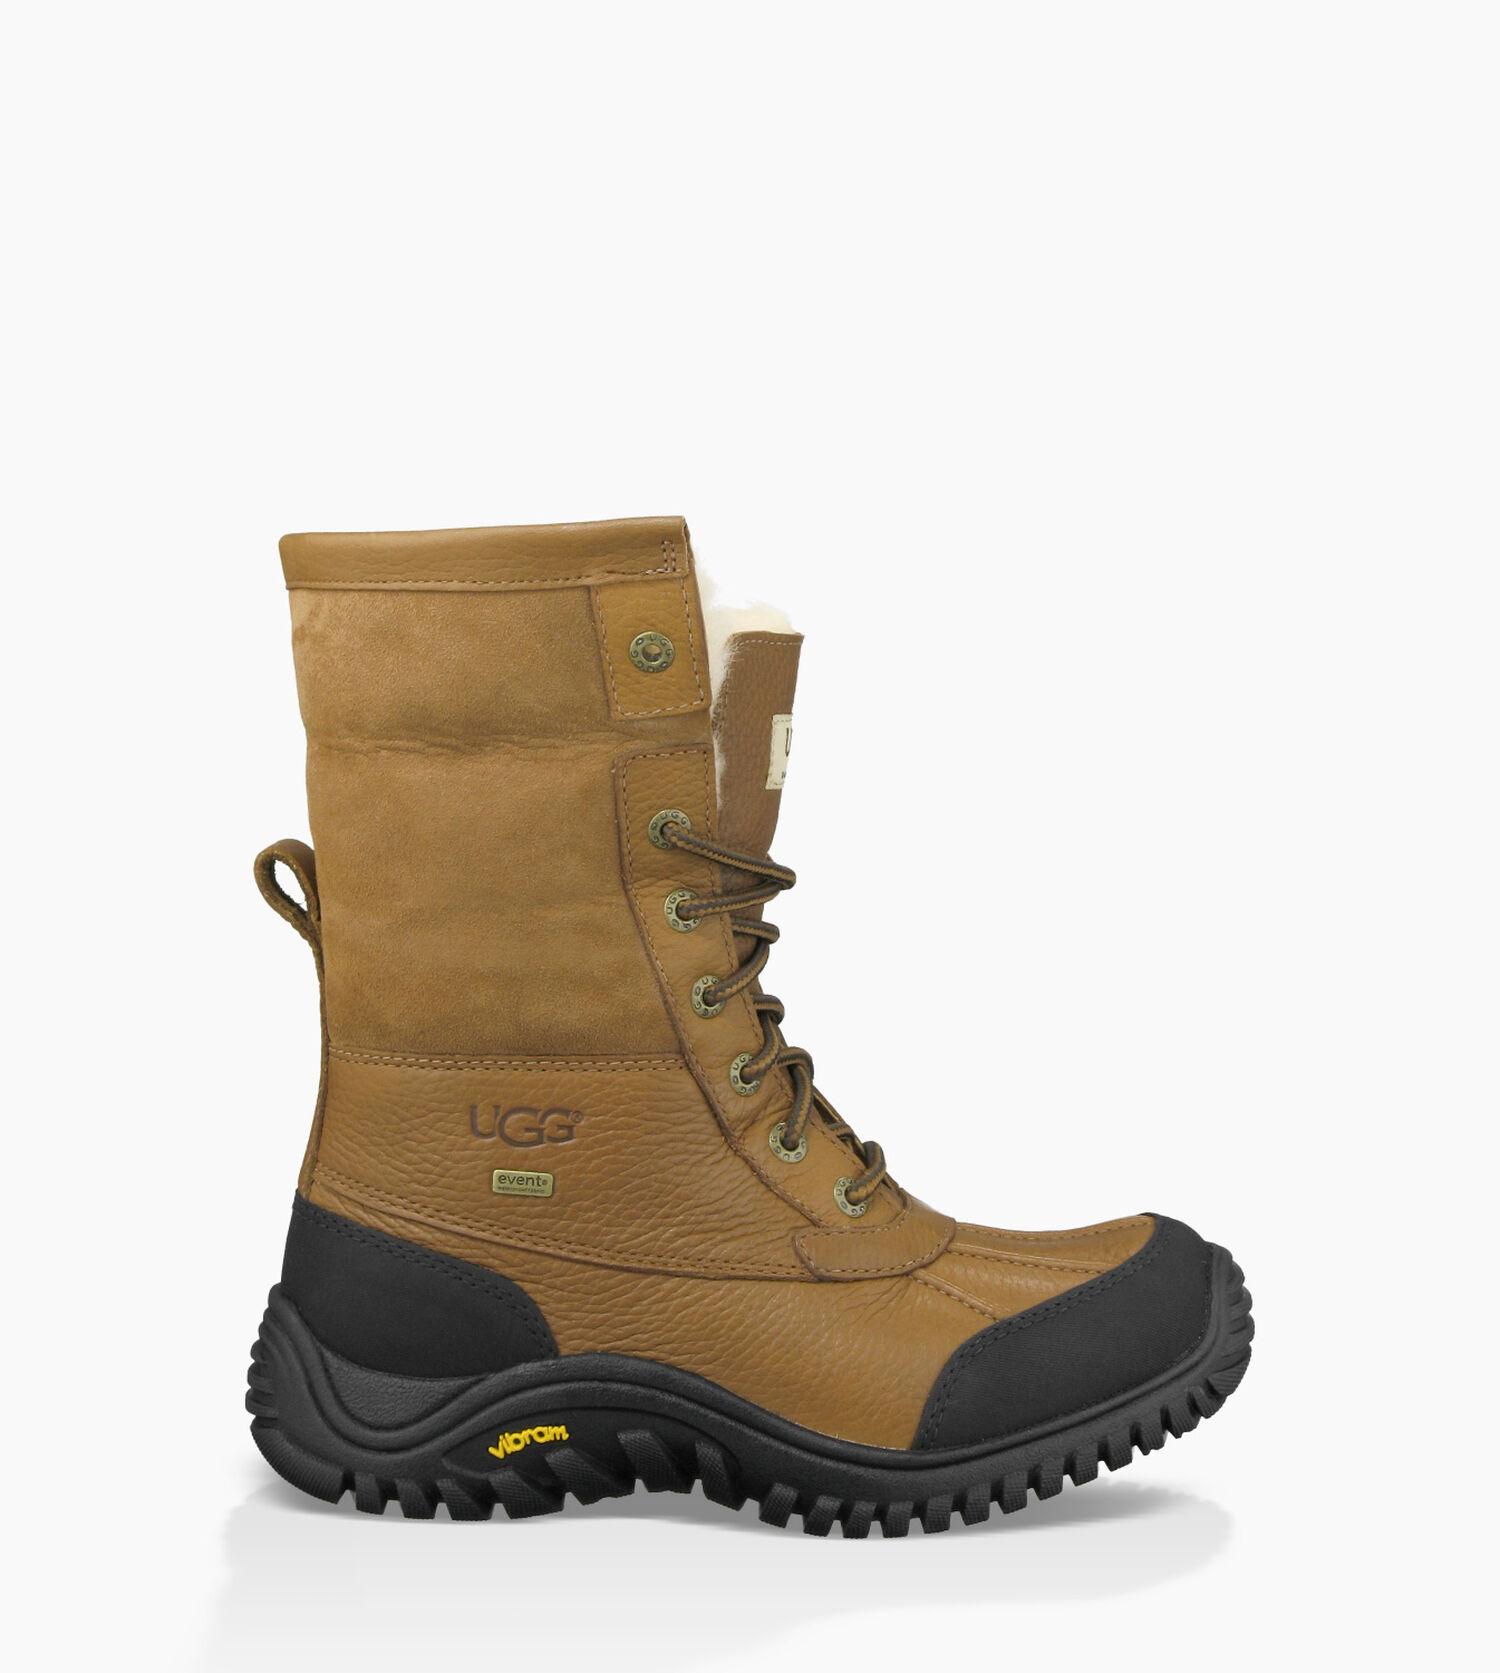 27f50df88f3 Ugg Adirondack Boot Ii Otter 5469